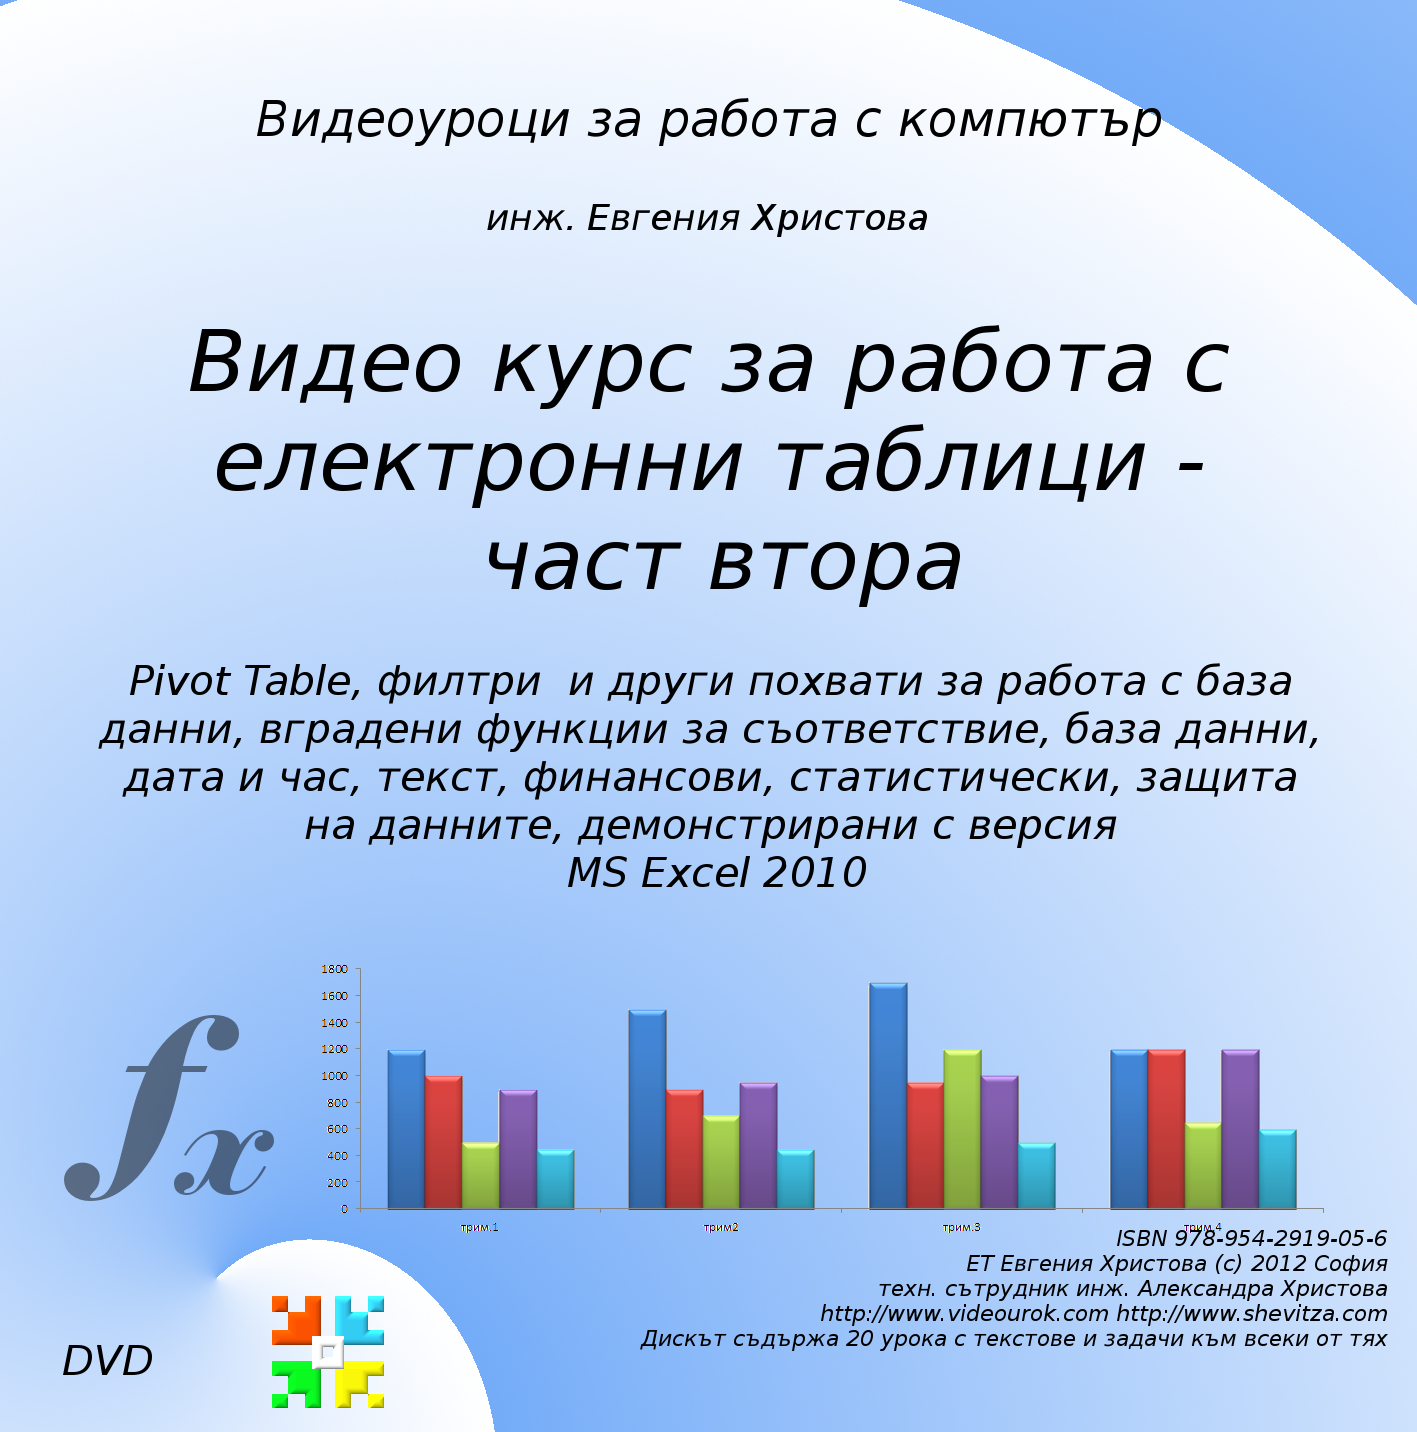 MS Excel - бизнес приложения